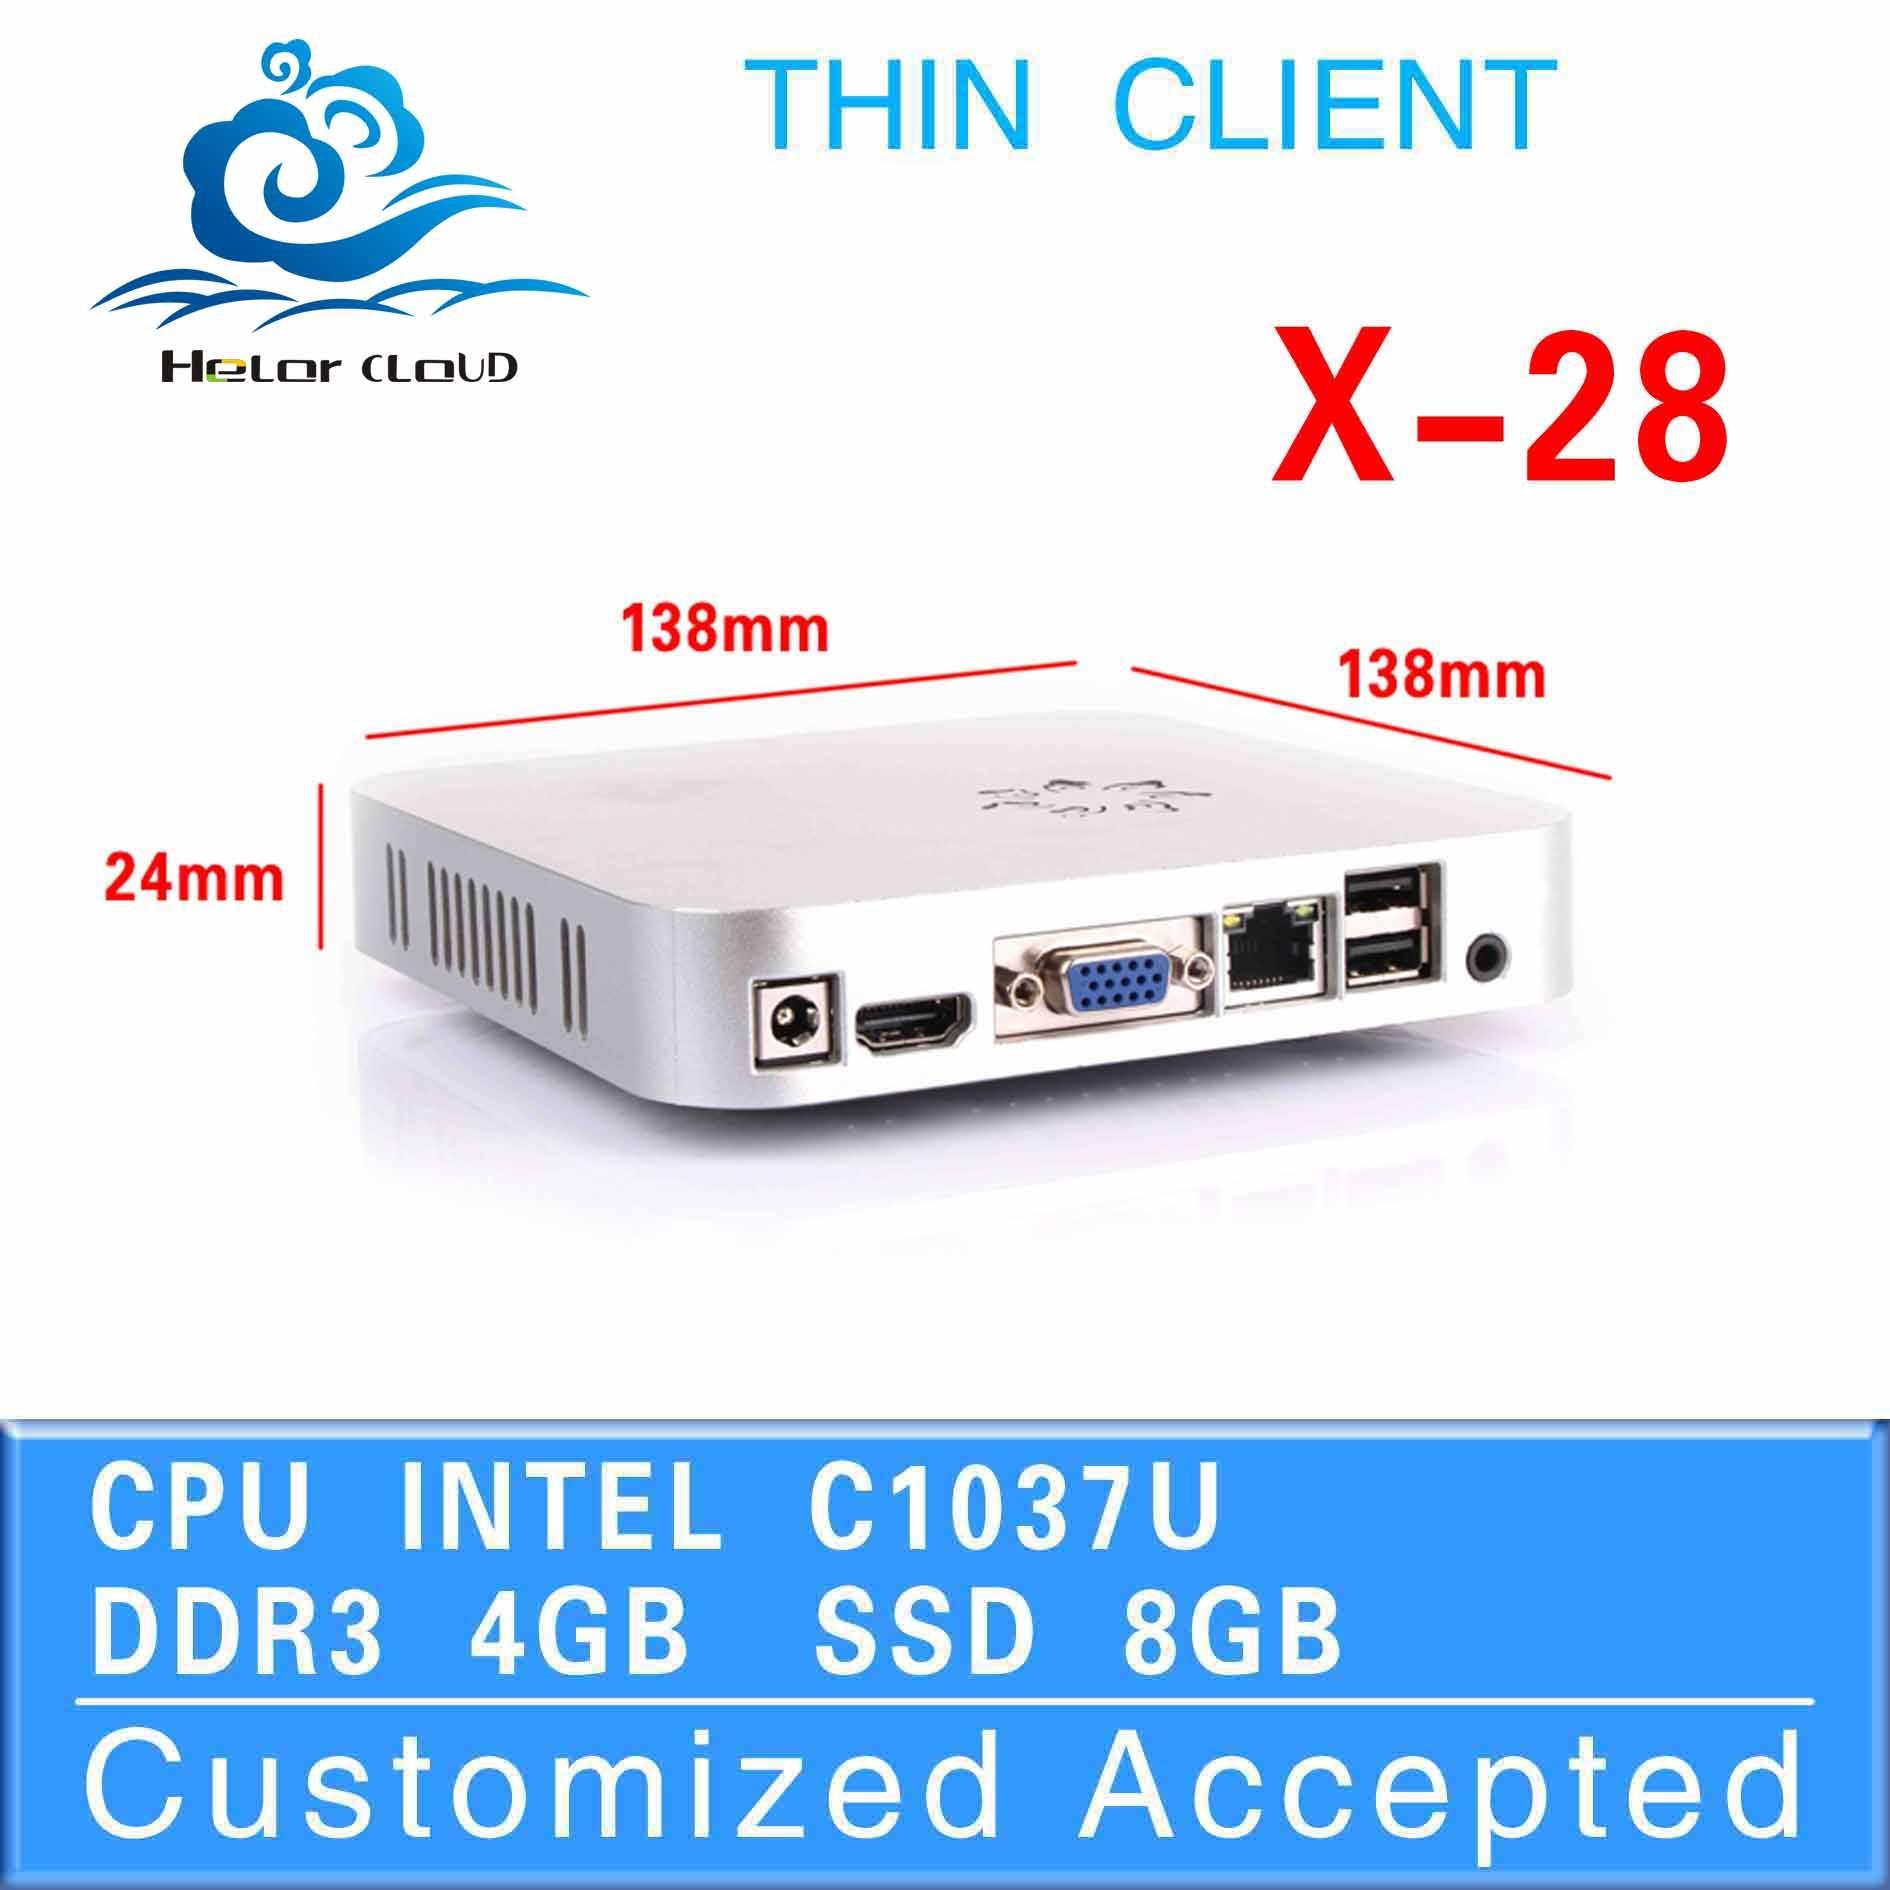 C1037U desktop computer thin client mini pc X-28 4GB RAM 8GB SSD support WIN7, Linux, Windows 95 etc.(China (Mainland))